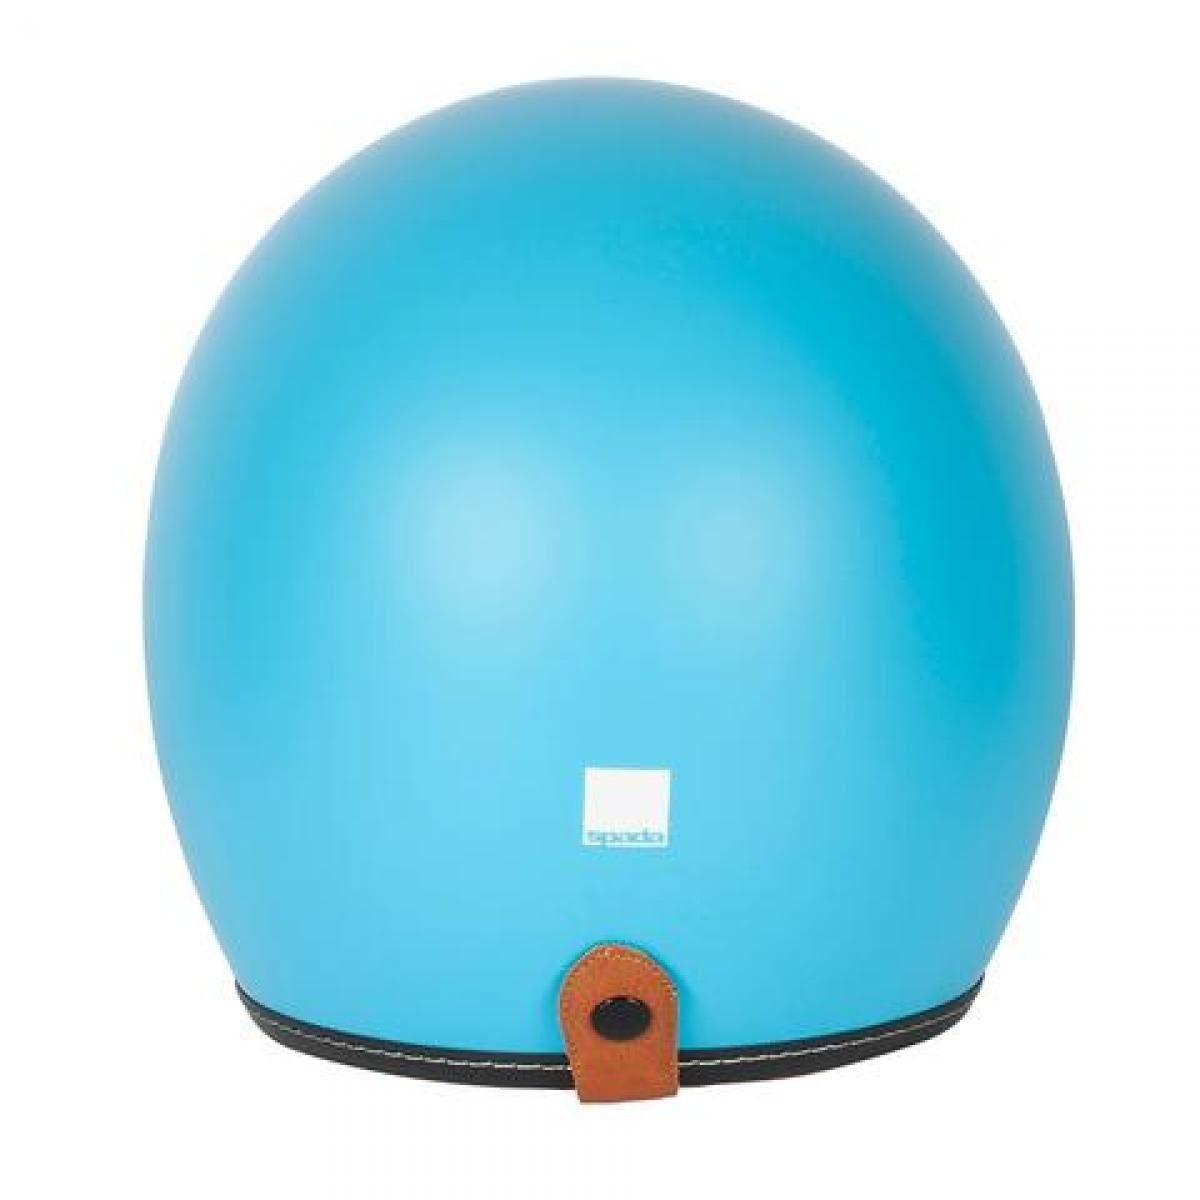 Spada-Raze-Ouvert-Casque-Bleu-Integre-Visiere miniature 18